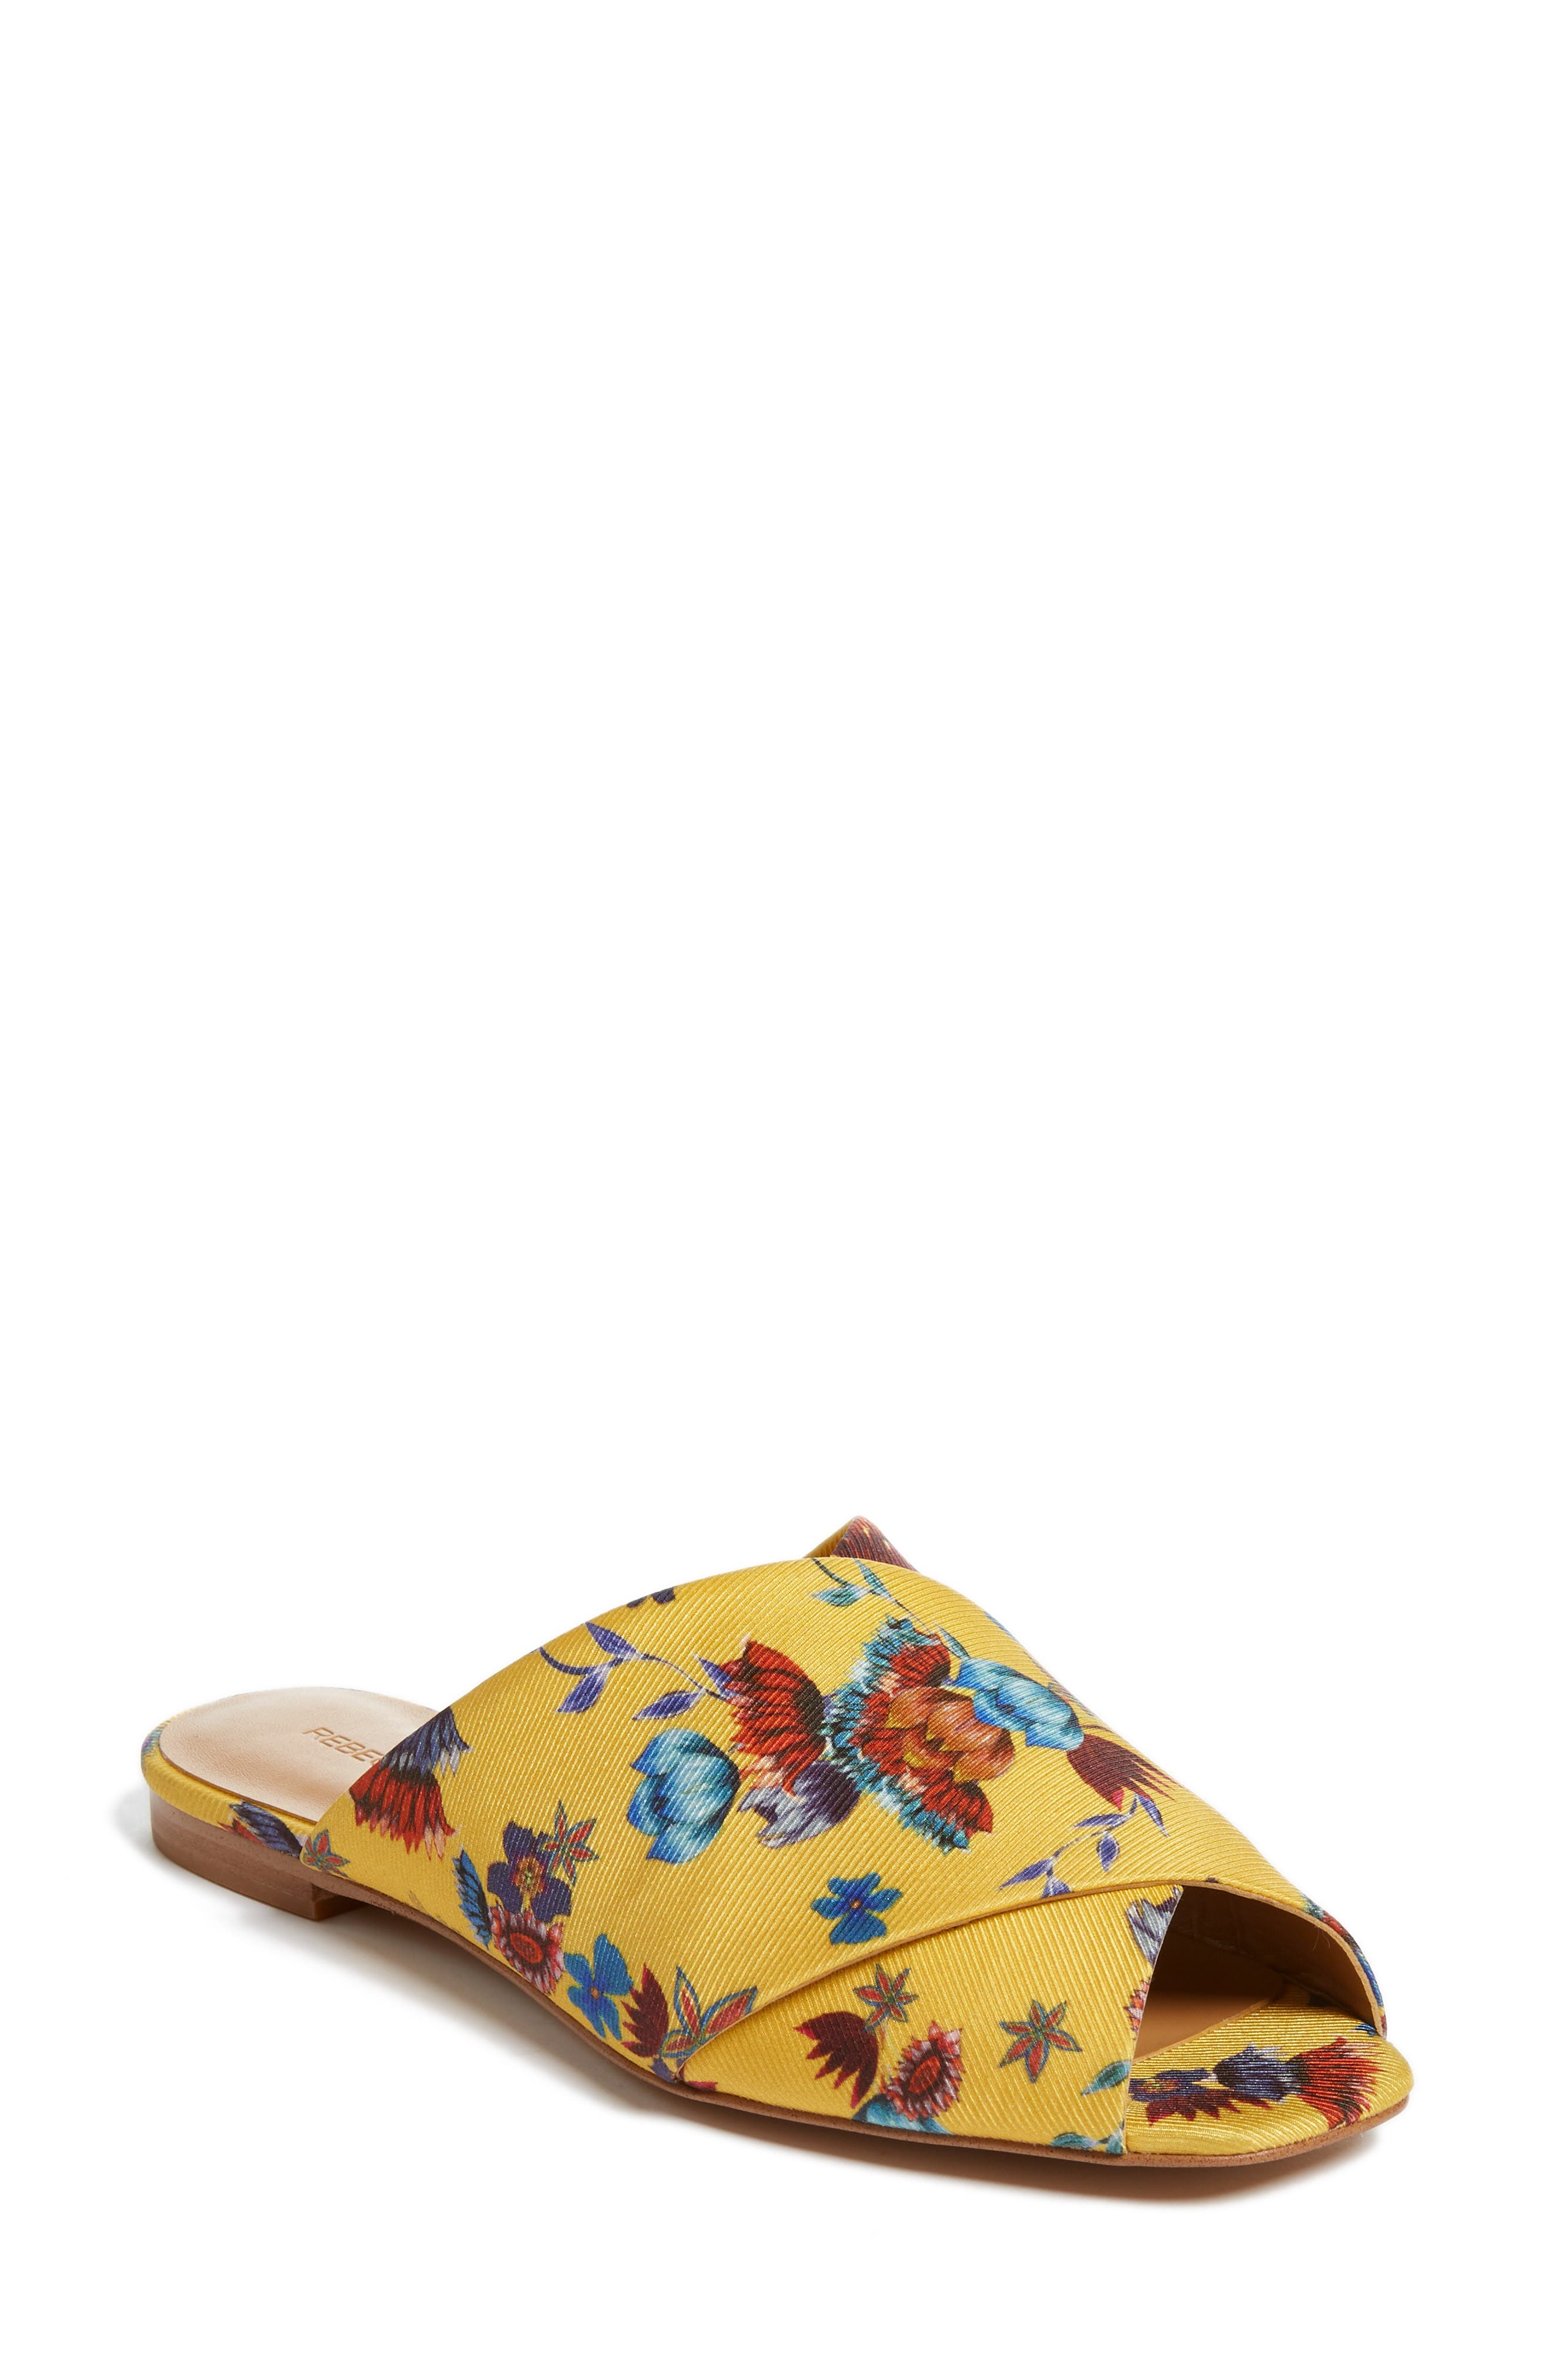 Anden Slide Sandal,                             Main thumbnail 1, color,                             Butterscotch Multi Print Silk